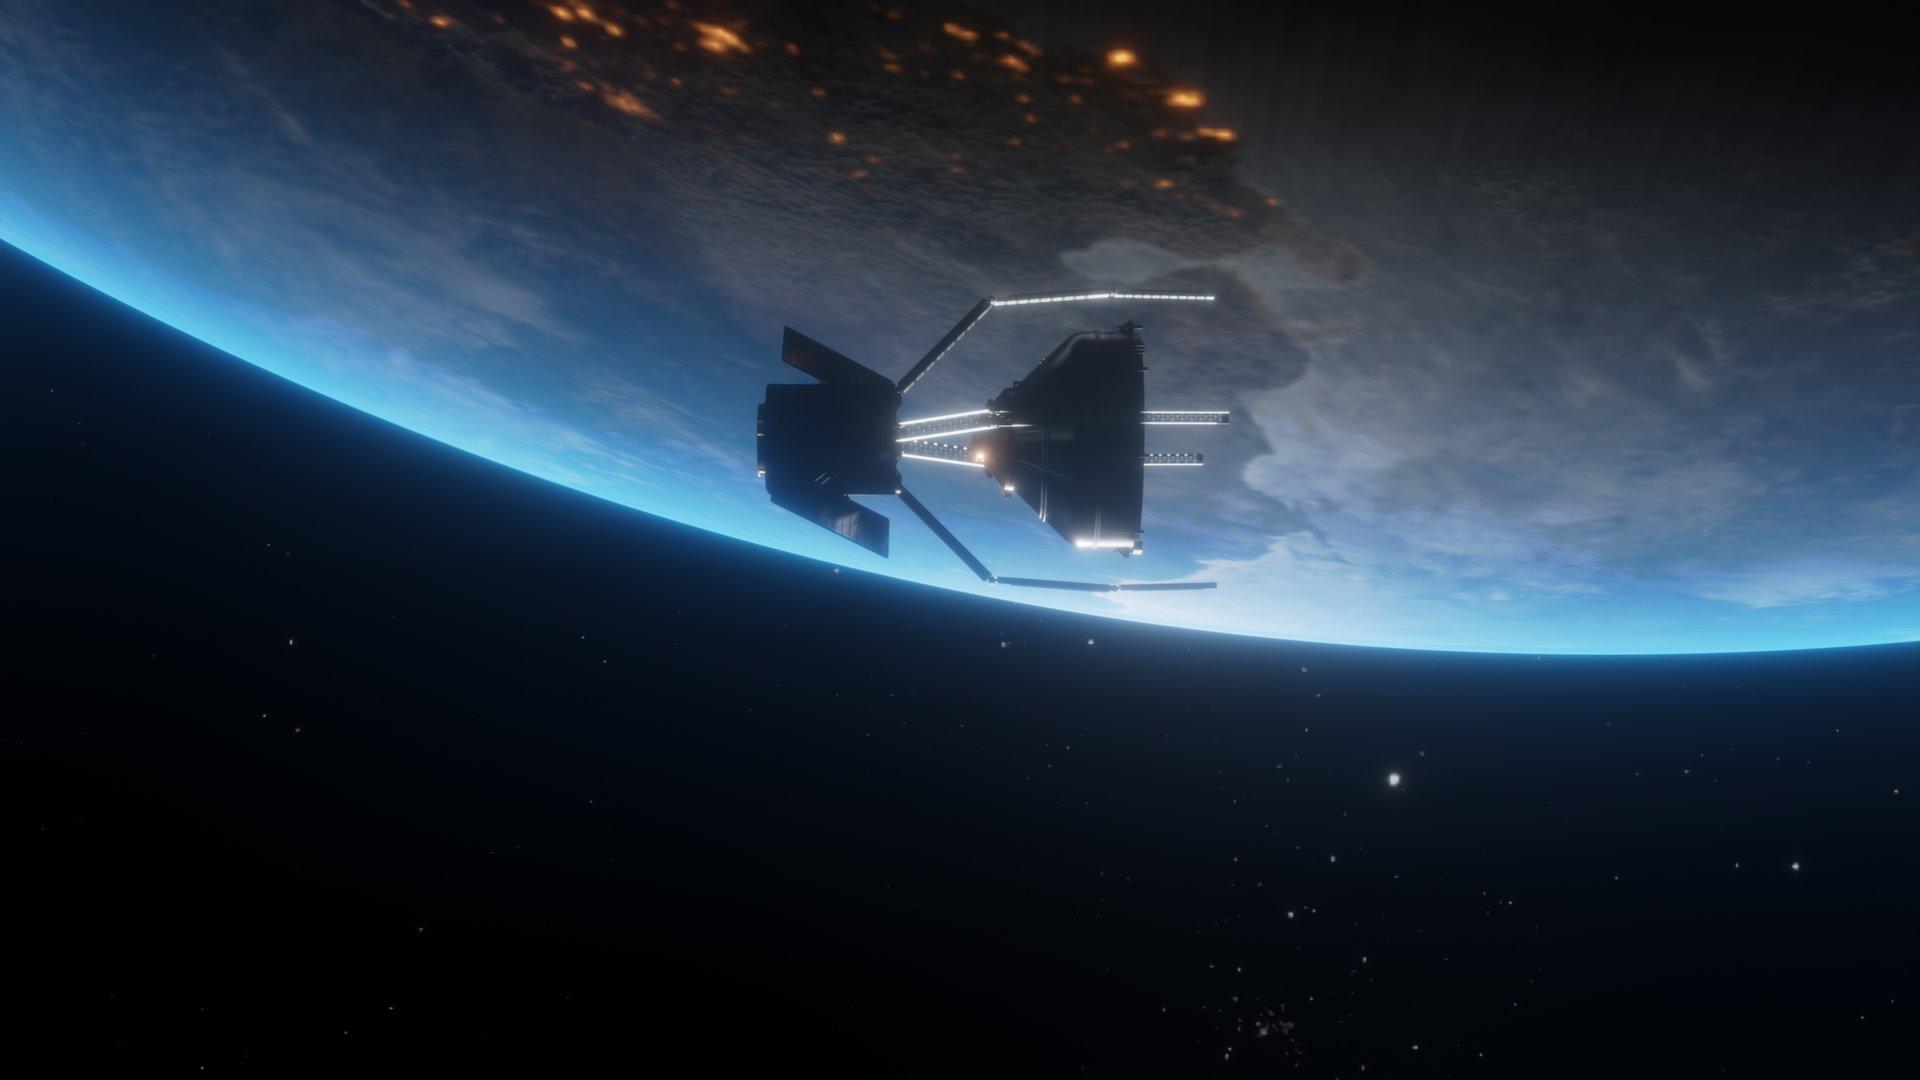 Swiss startup ClearSpace wins ESA contract to deorbit Vega rocket debris